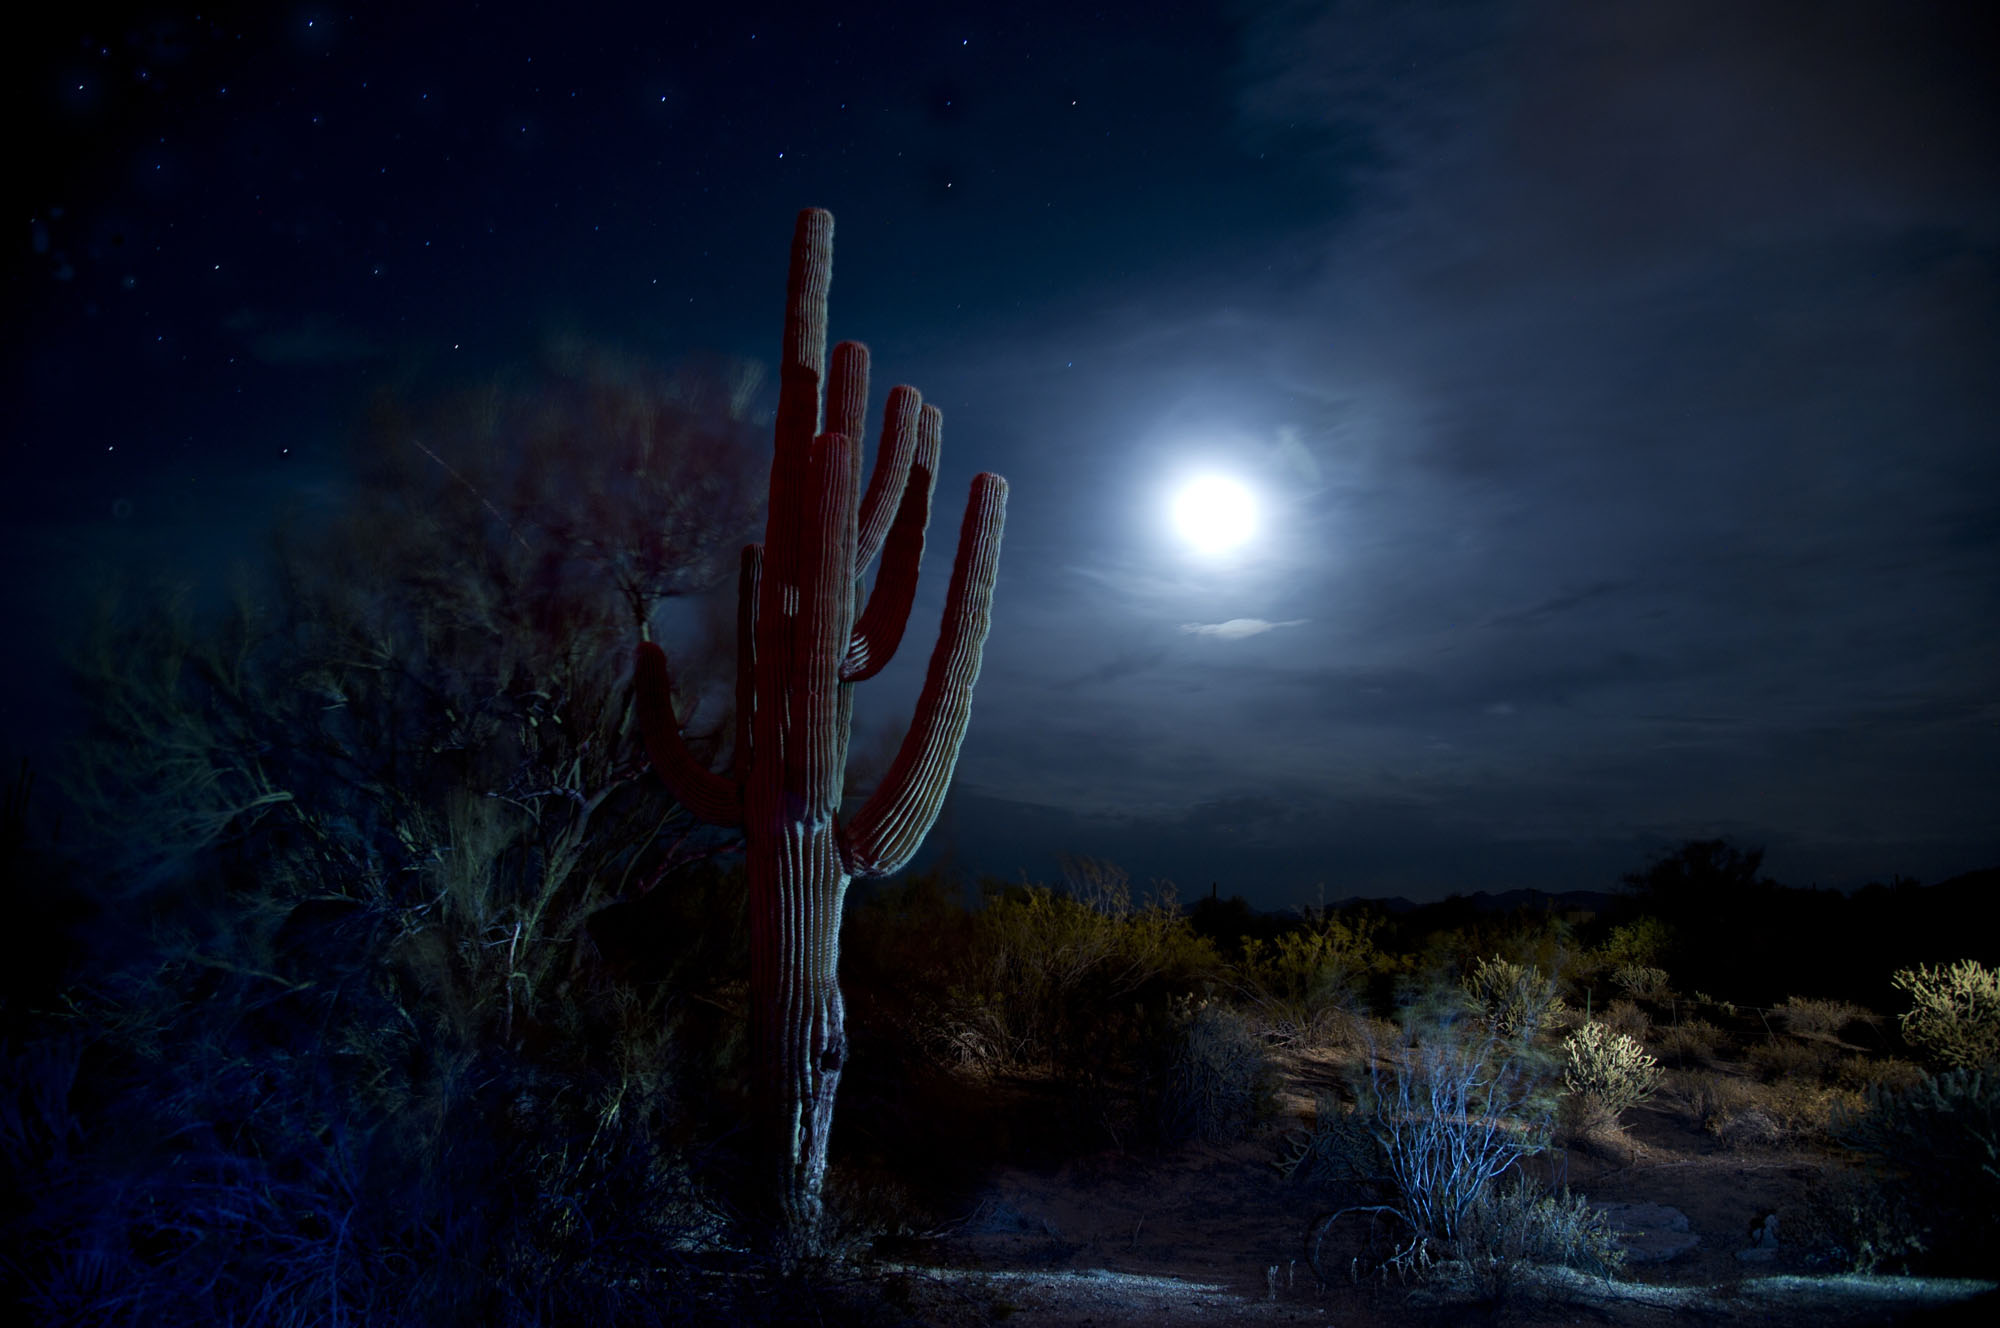 Cactus. Salt River Pima-Maricopa Indian Community, AZ.